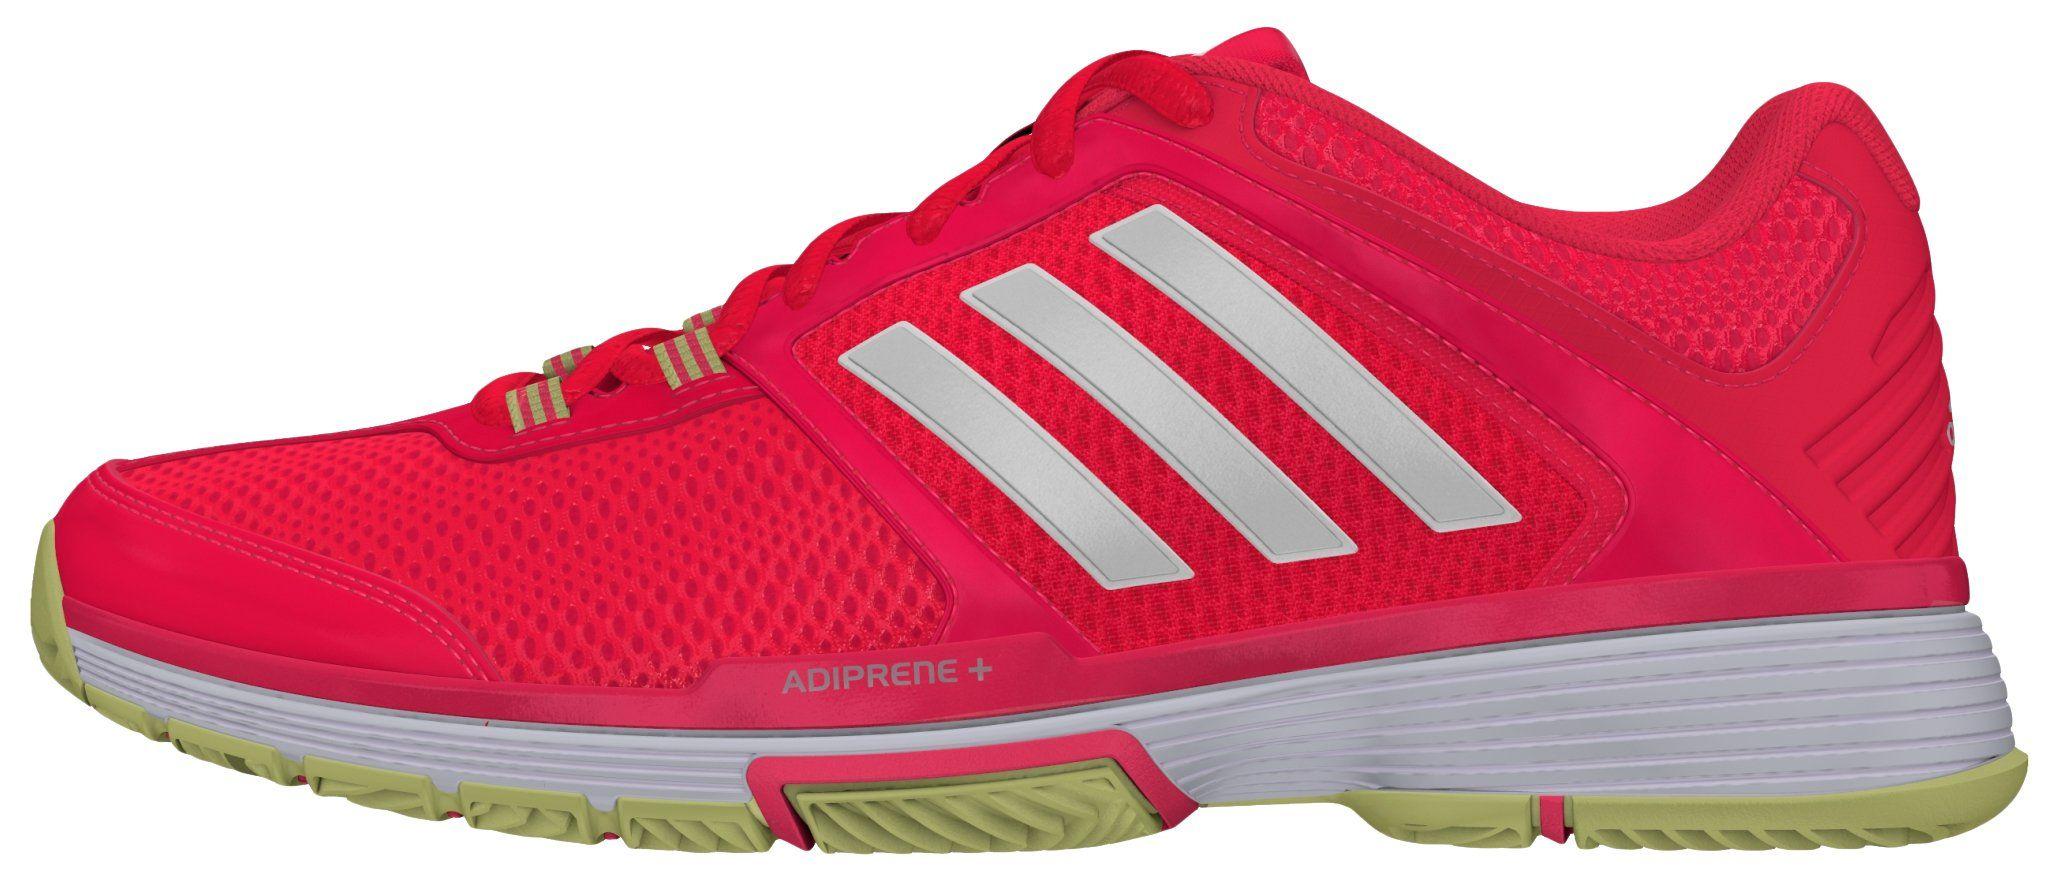 Adidas Barricade Club Women's Court Shoes - AW16 - 8 ...